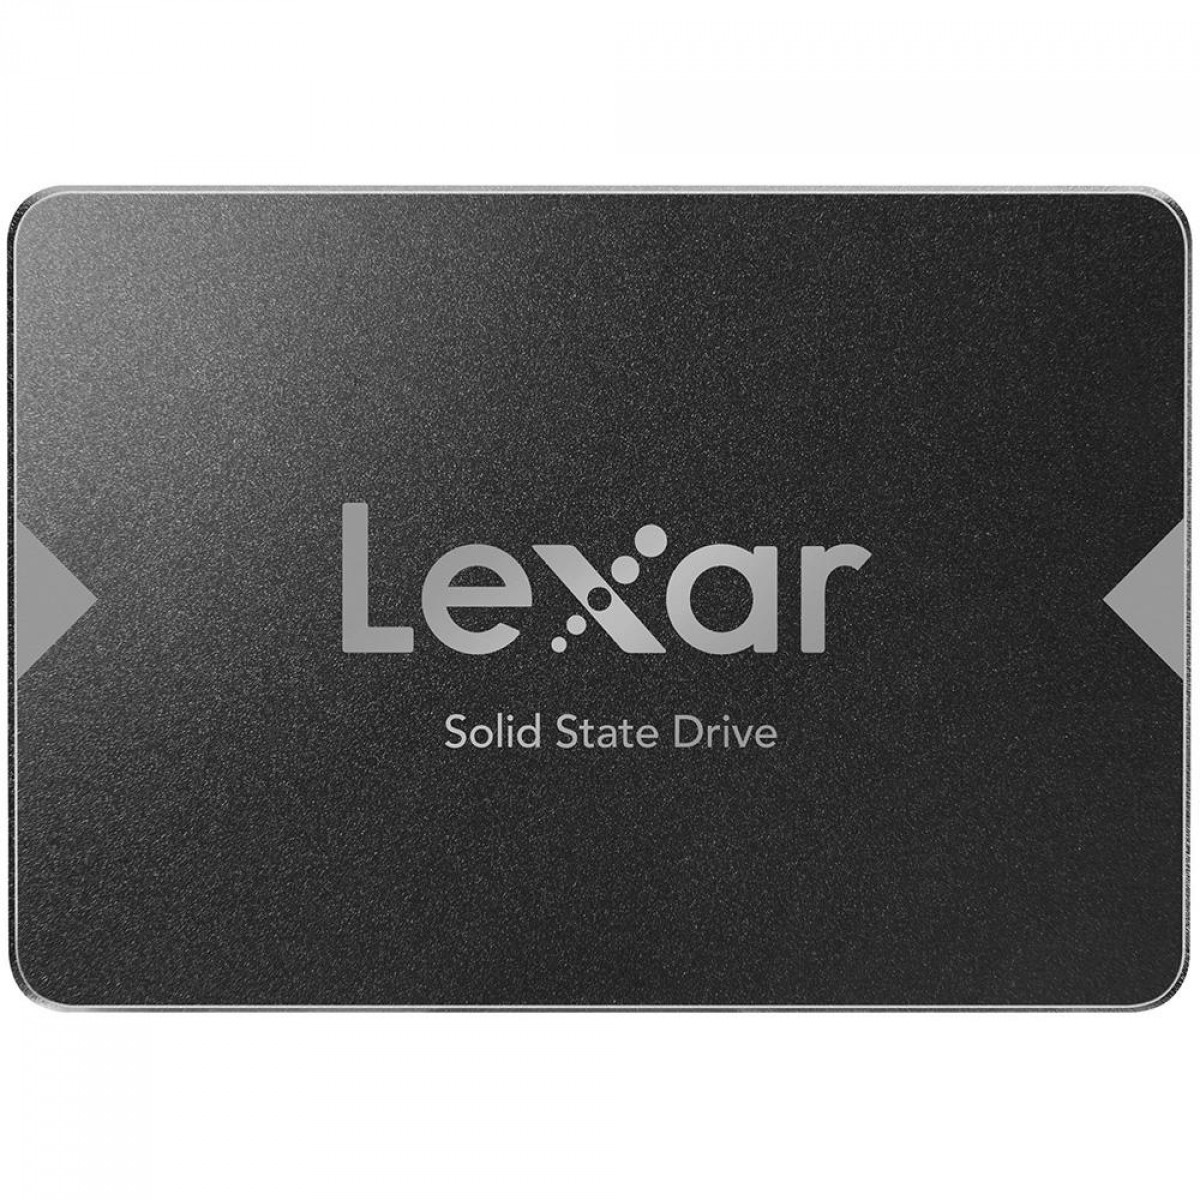 SSD LEXAR 512GB